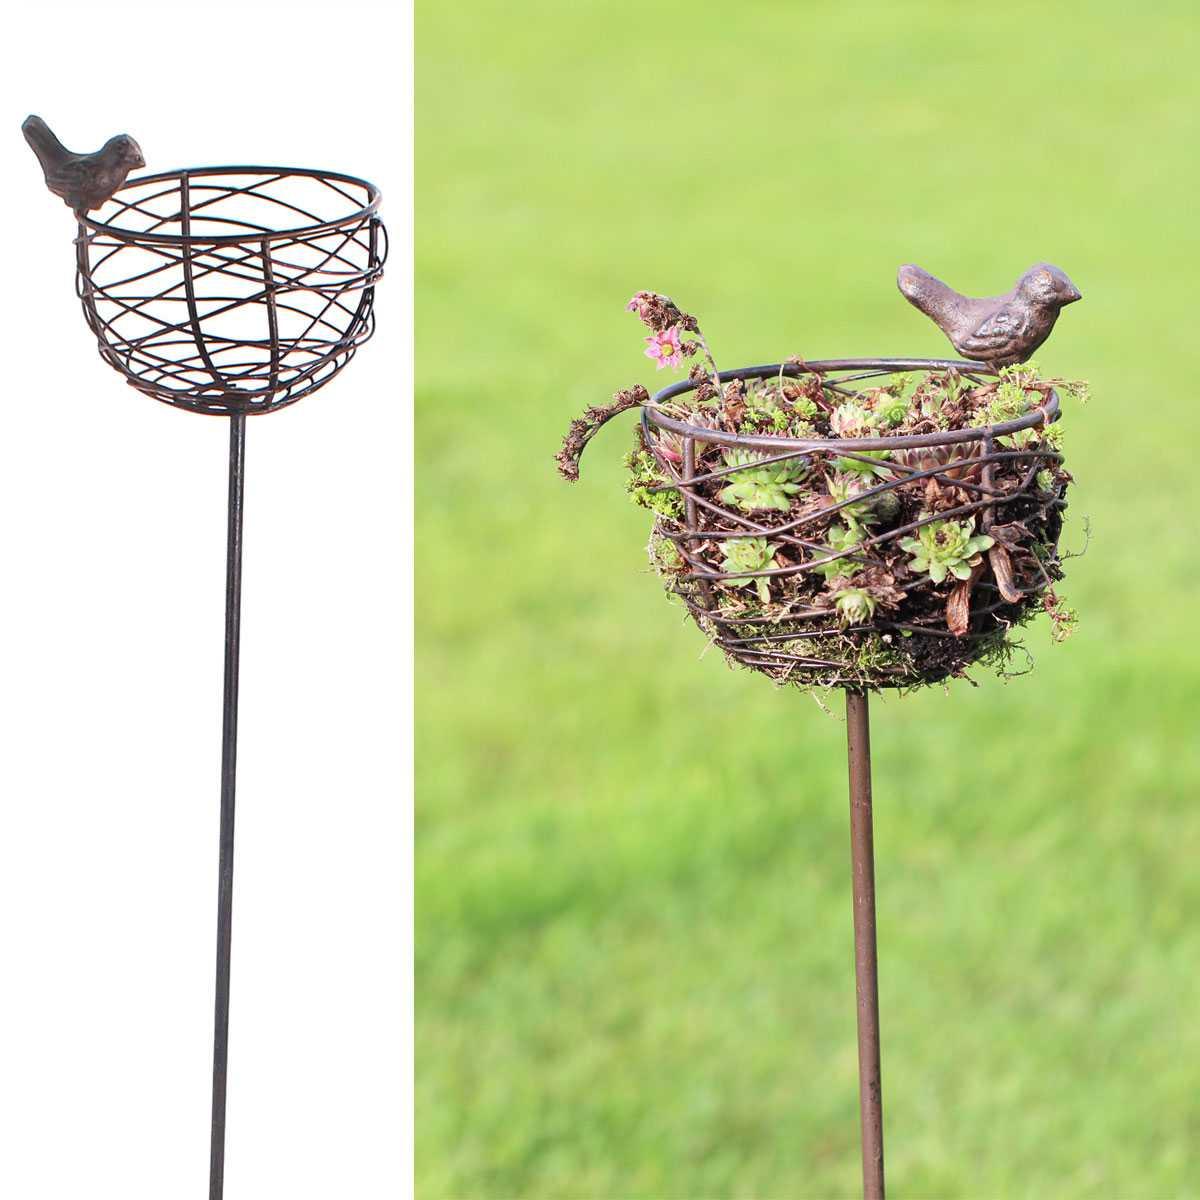 mangeoire nid oiseau en fonte et fil d 39 acier oiseaux du. Black Bedroom Furniture Sets. Home Design Ideas